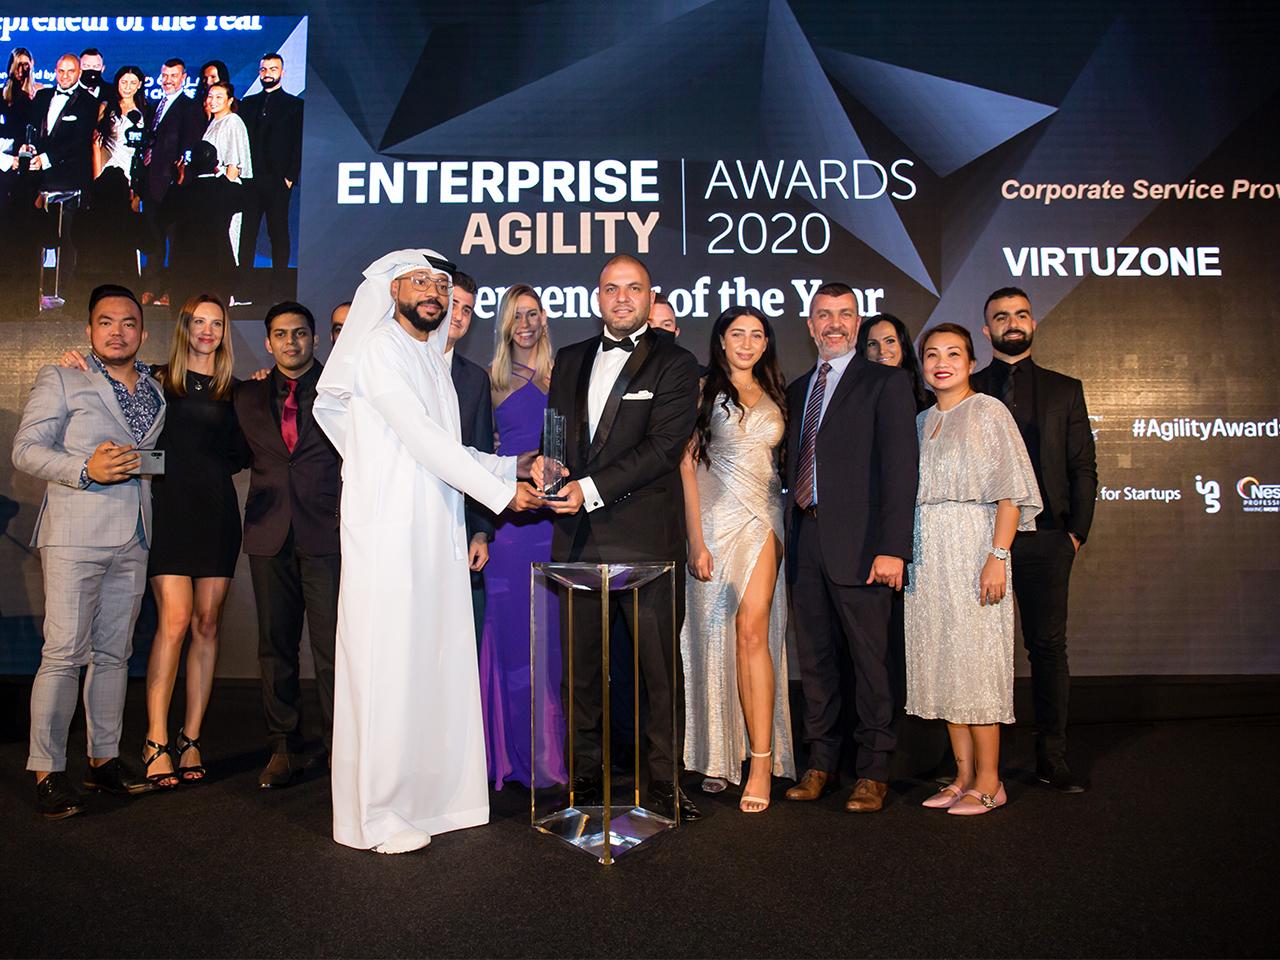 Entrepreneur Enterprise Agility Awards